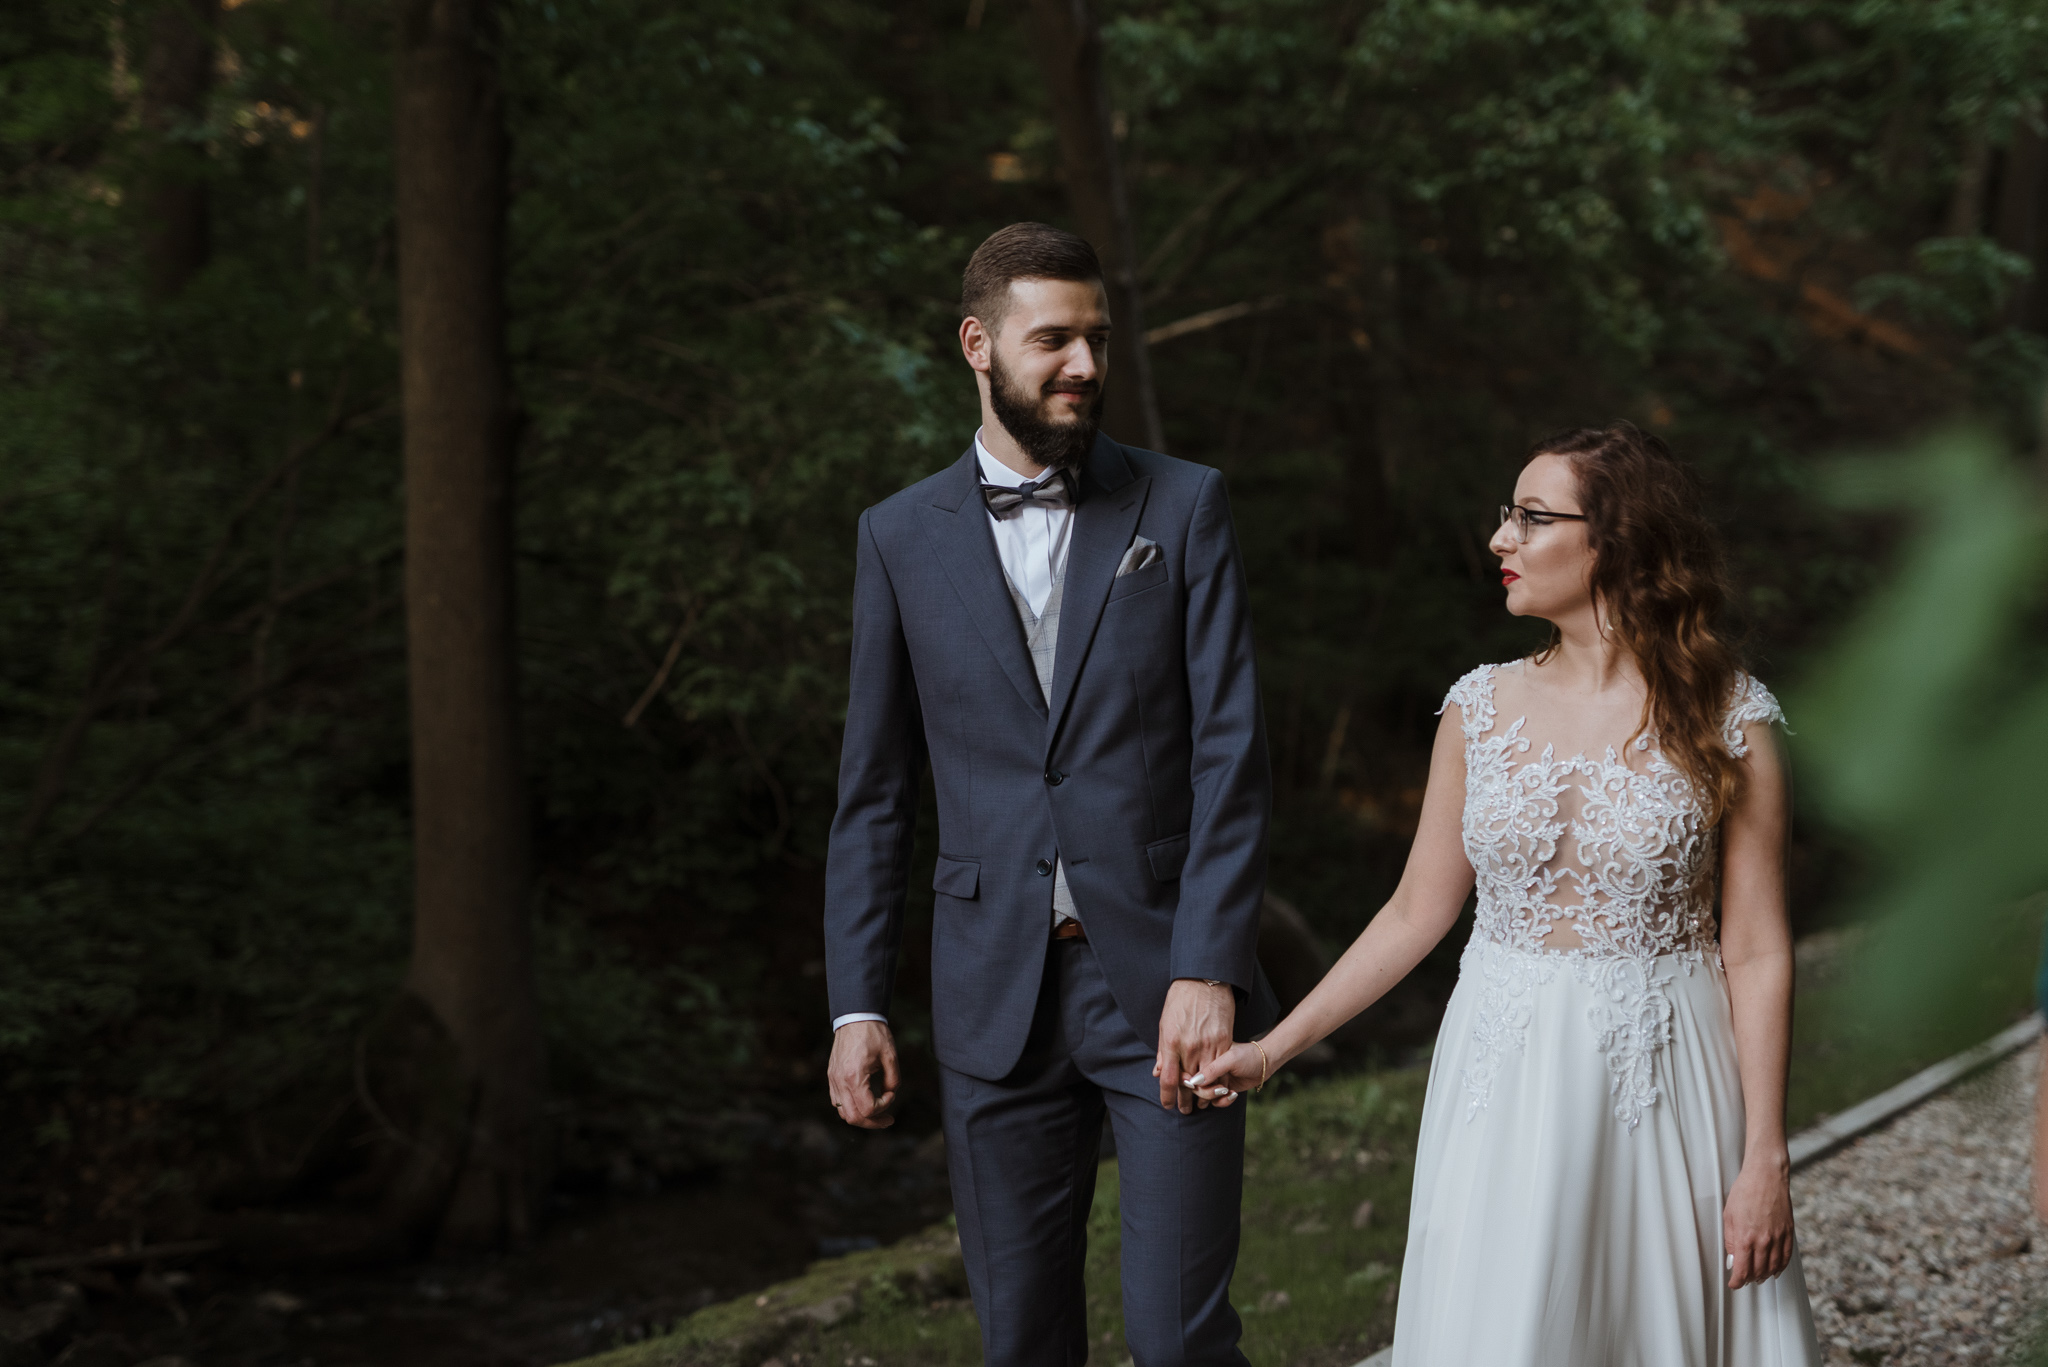 Edyta & Damian